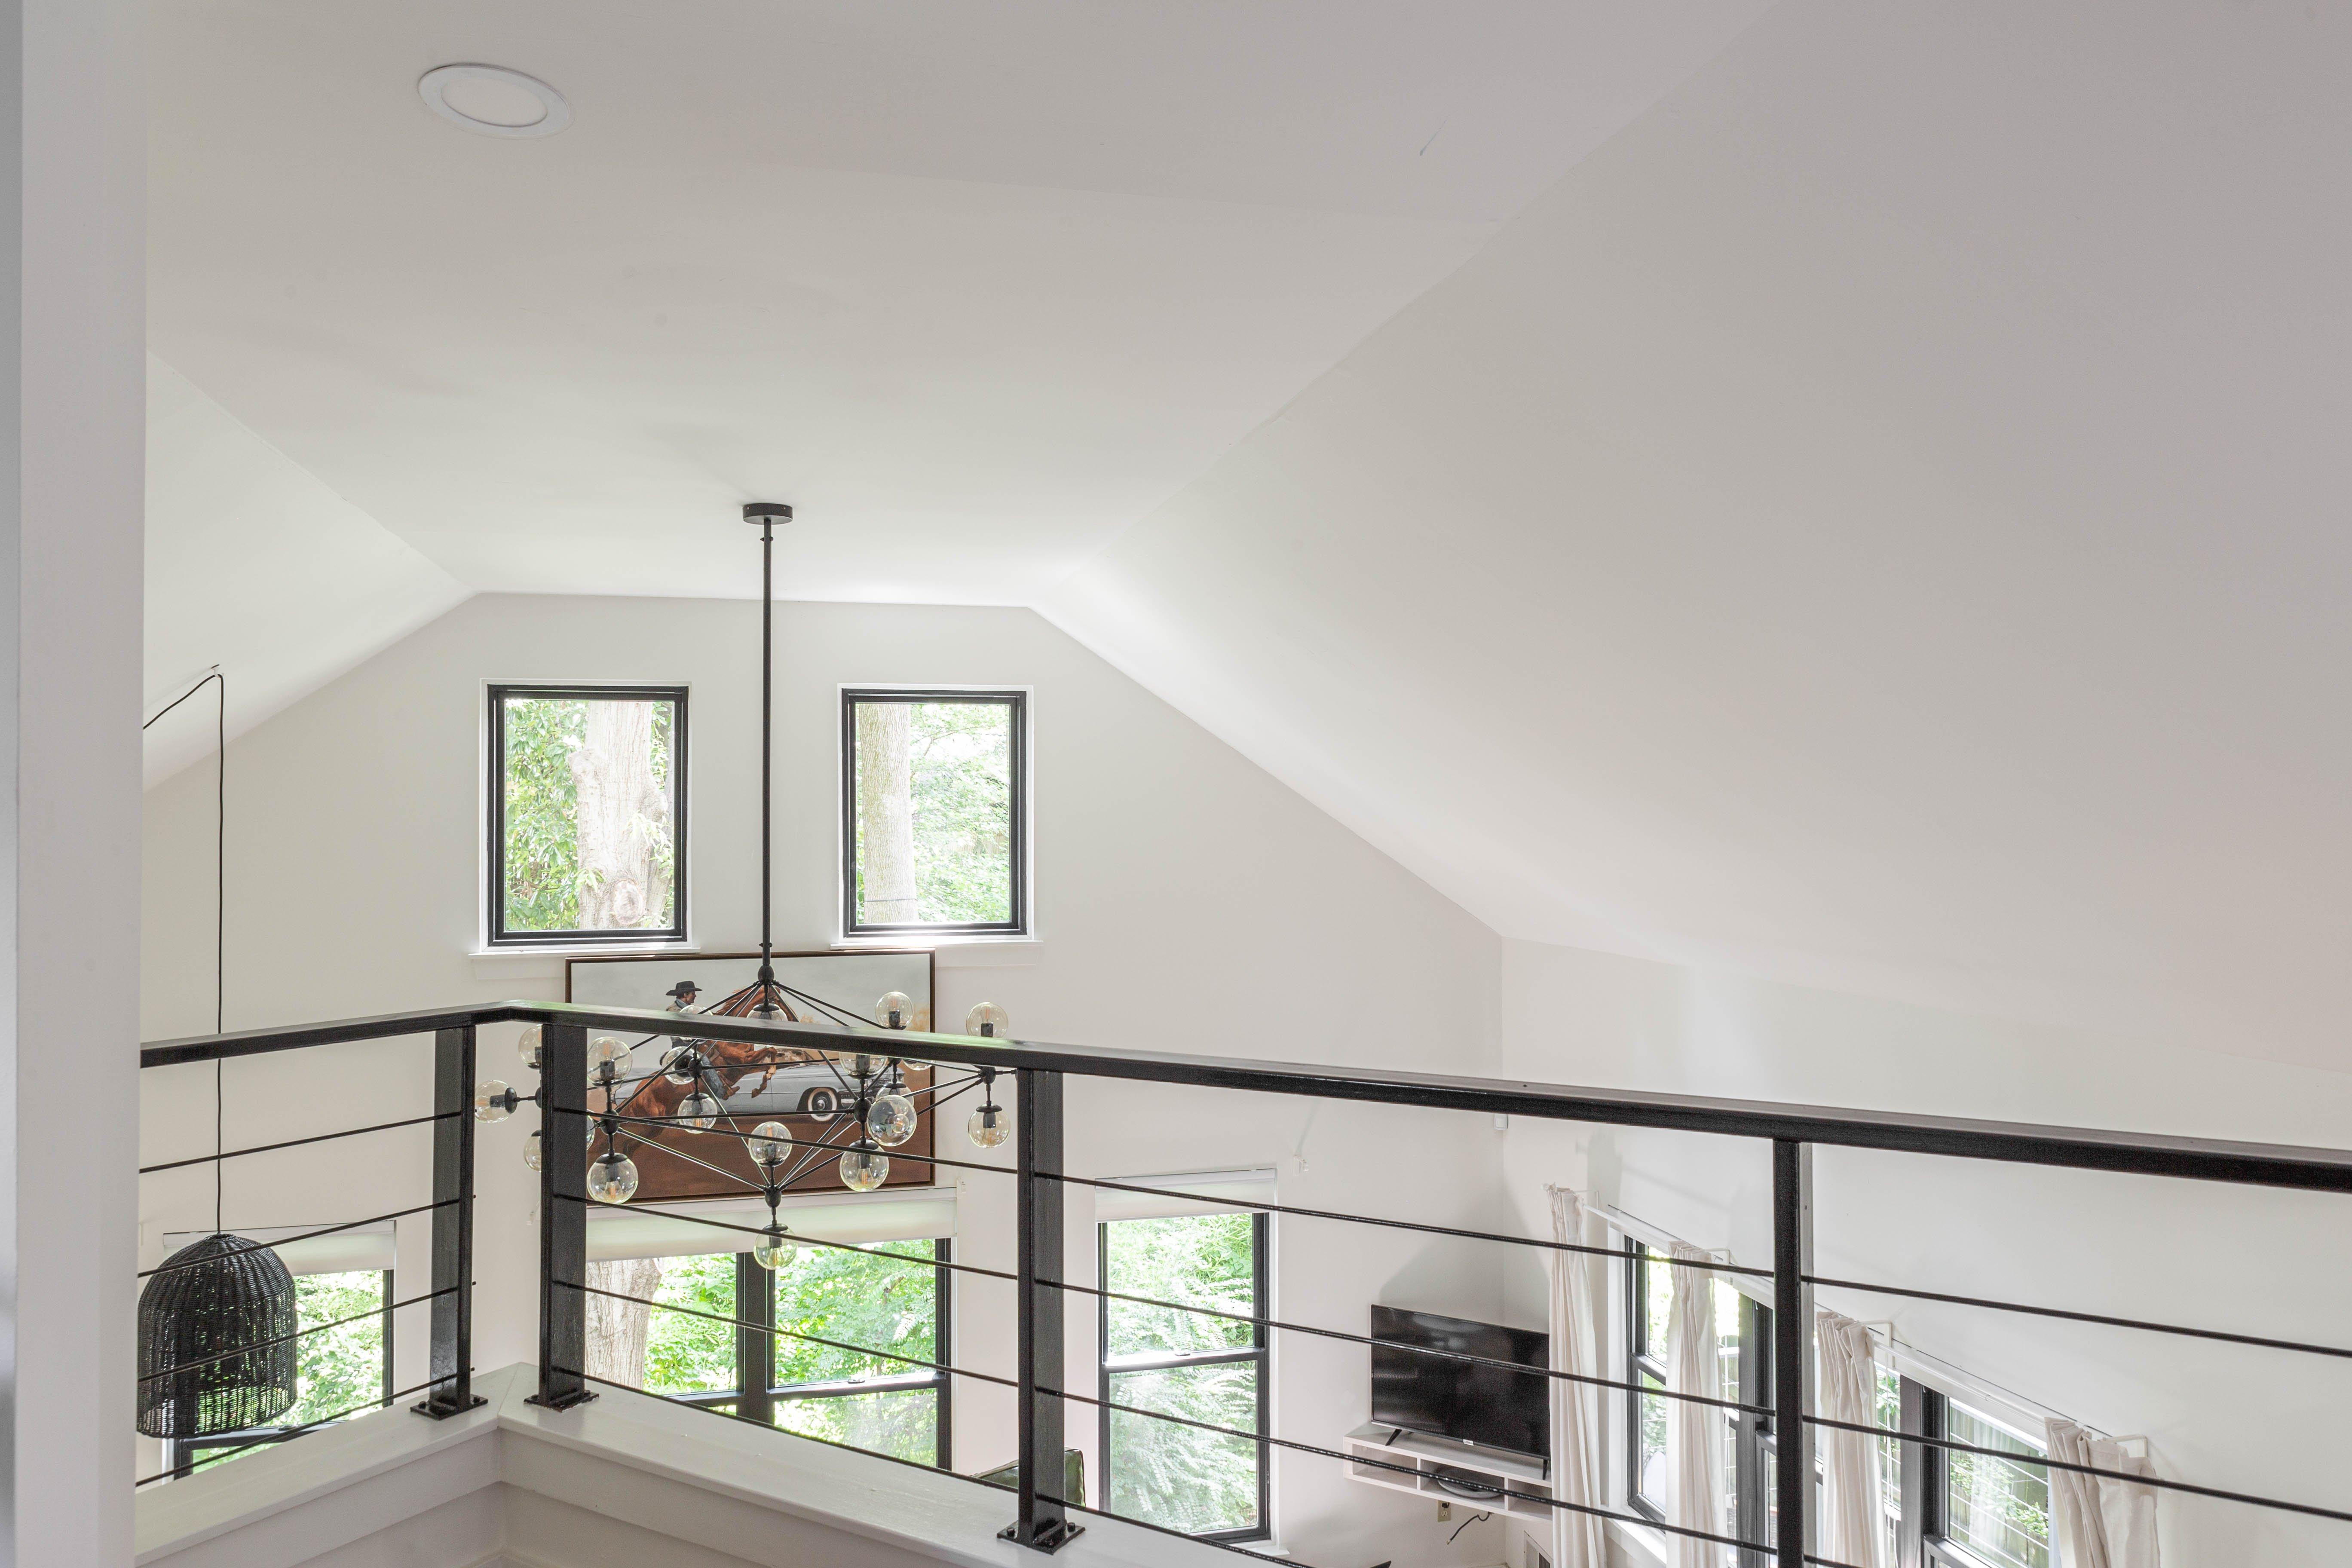 12 office loft 20210627-IMG_7656.jpg